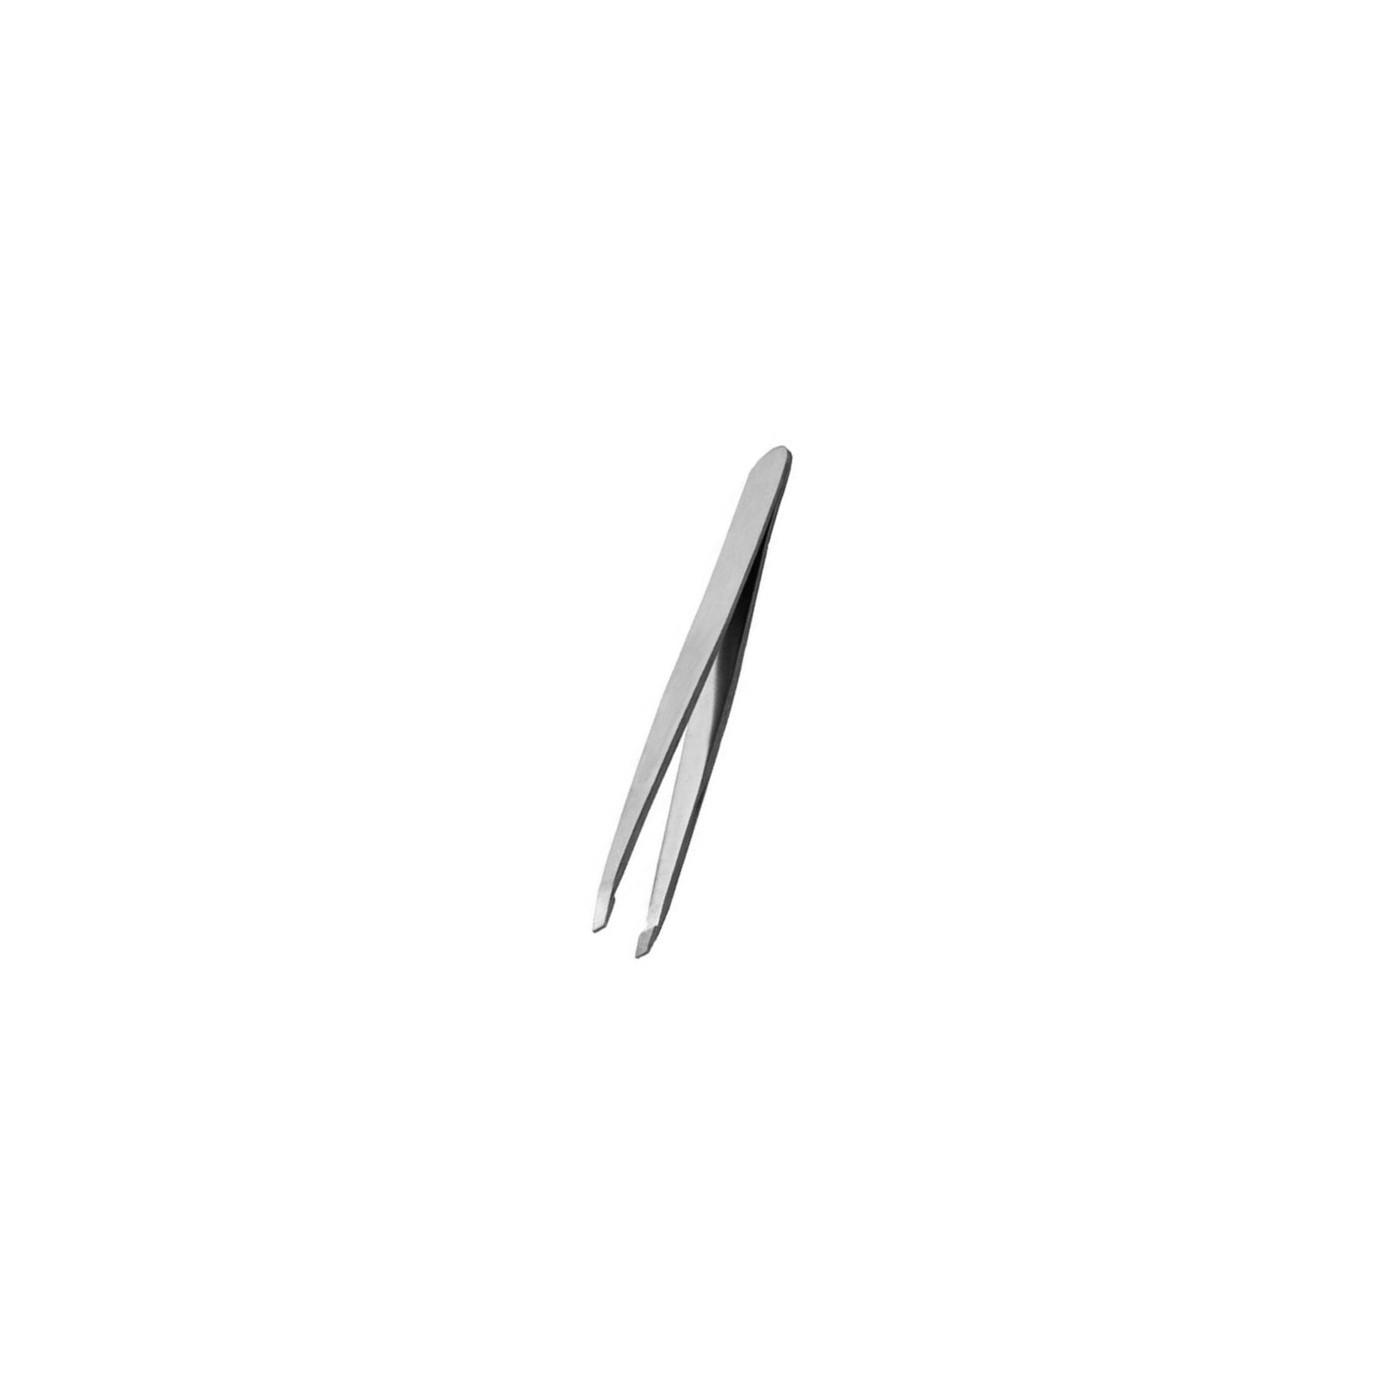 Pinzette in acciaio inossidabile (9 cm)